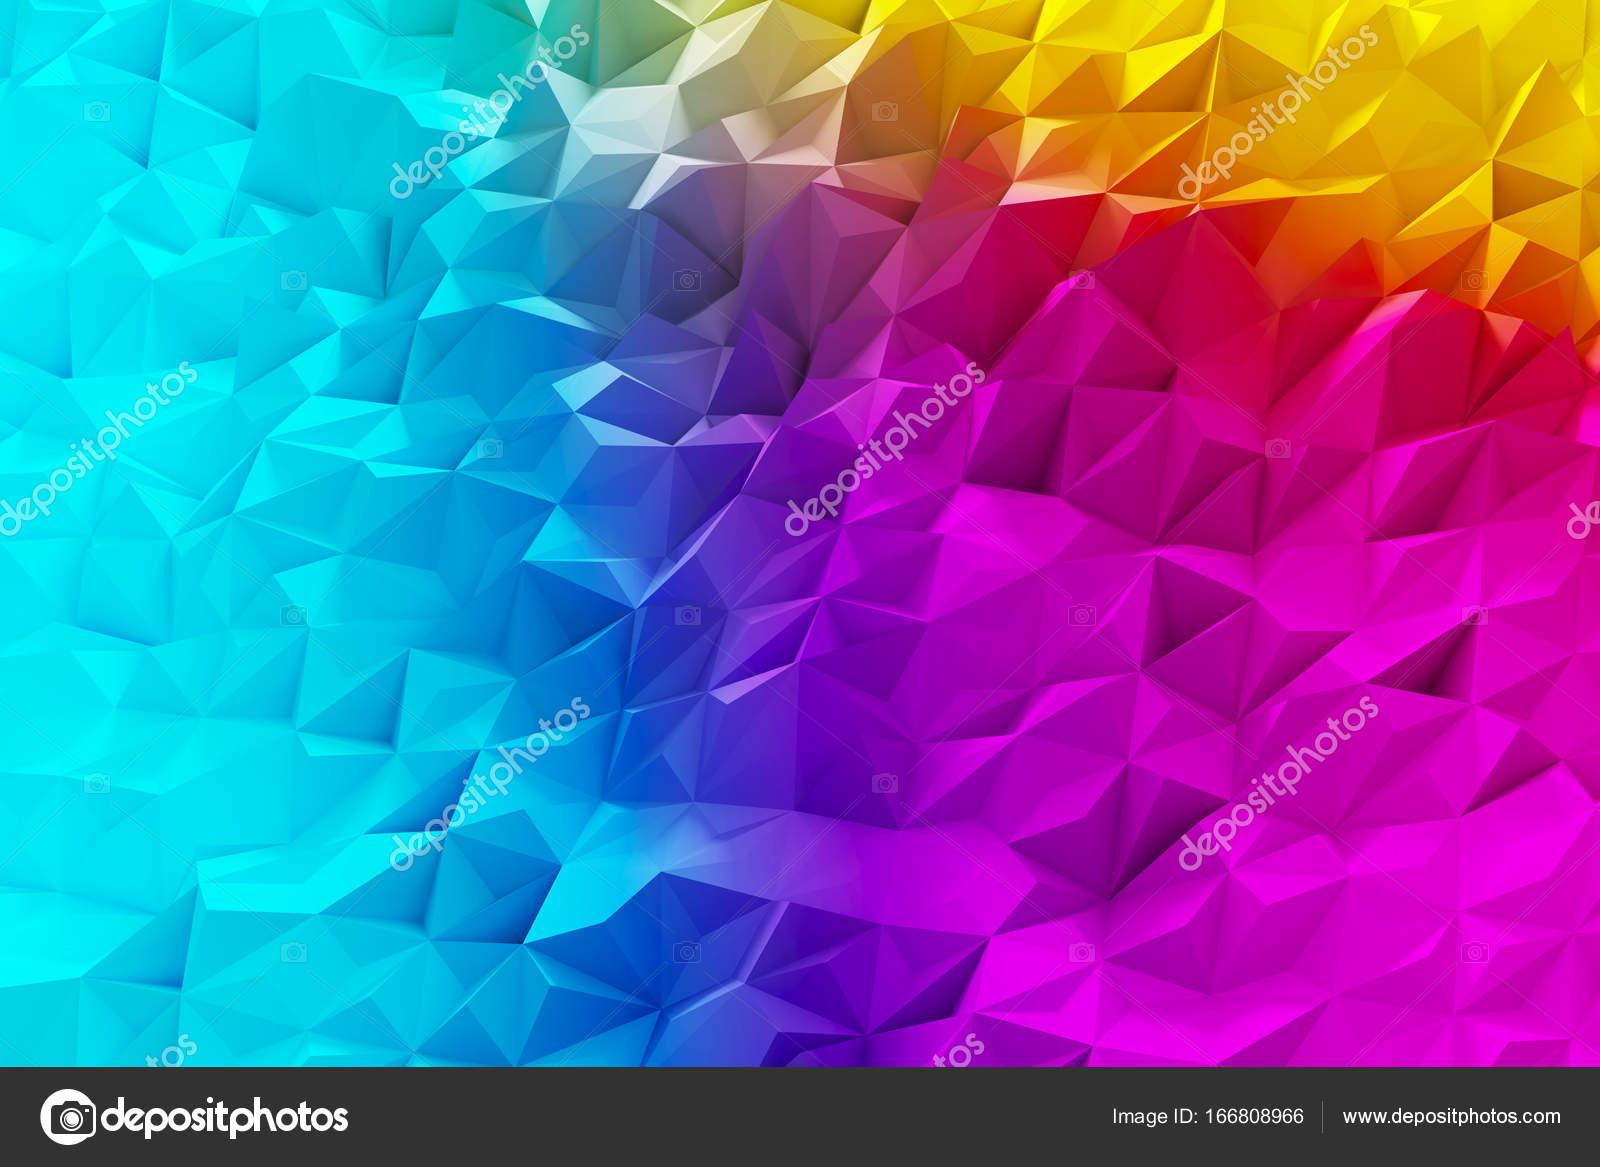 Fondo Geométrico: Fondos De Pantalla Geometricos